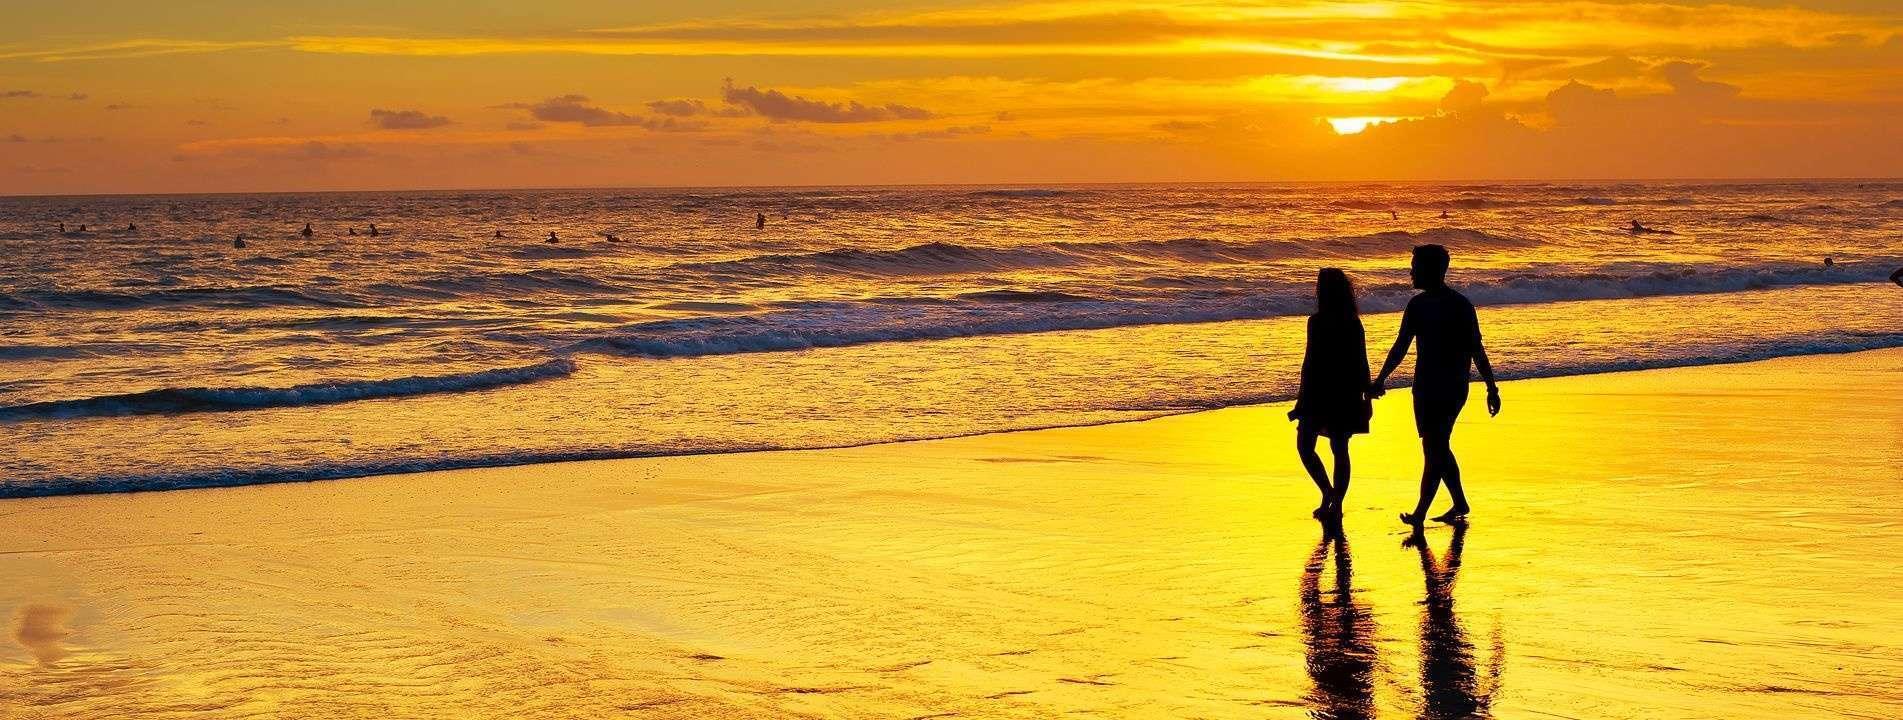 15-Day Myanmar, Thailand and Bali Honeymoon